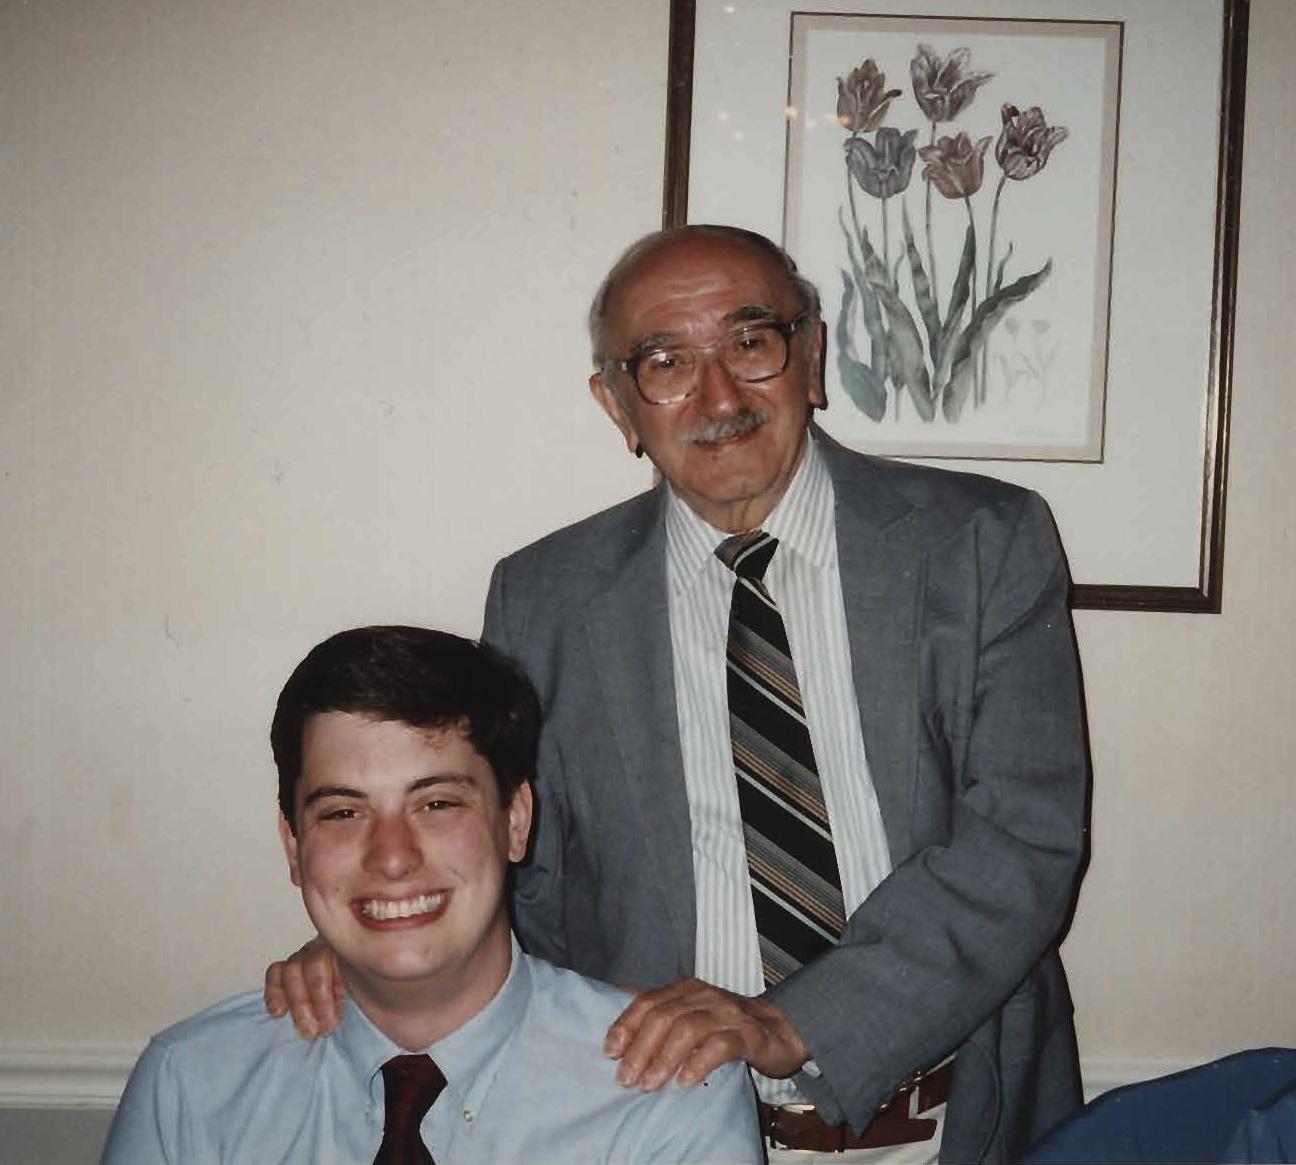 Italian Grandfather John De Nugent